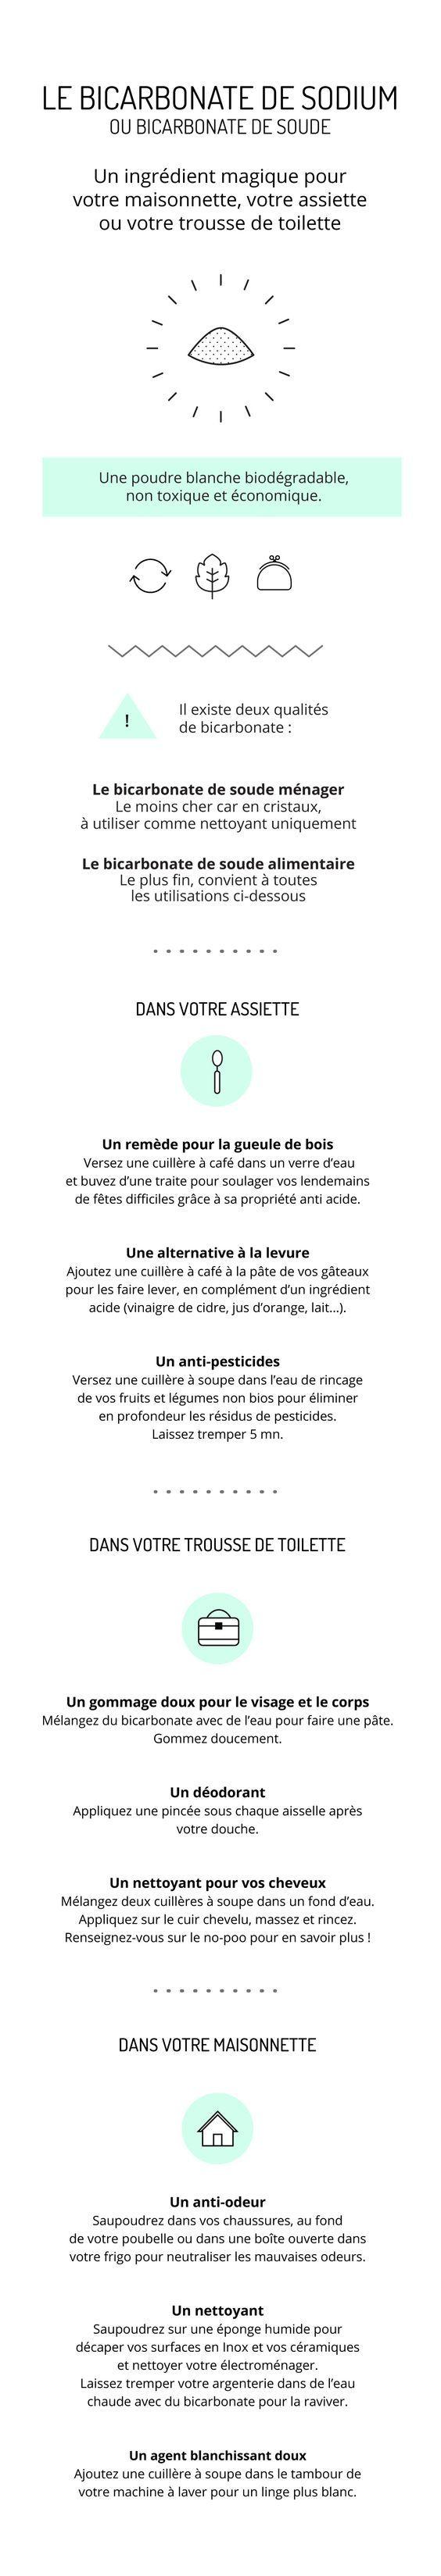 Le bicarbonate de soude / https://www.idecologie.net: